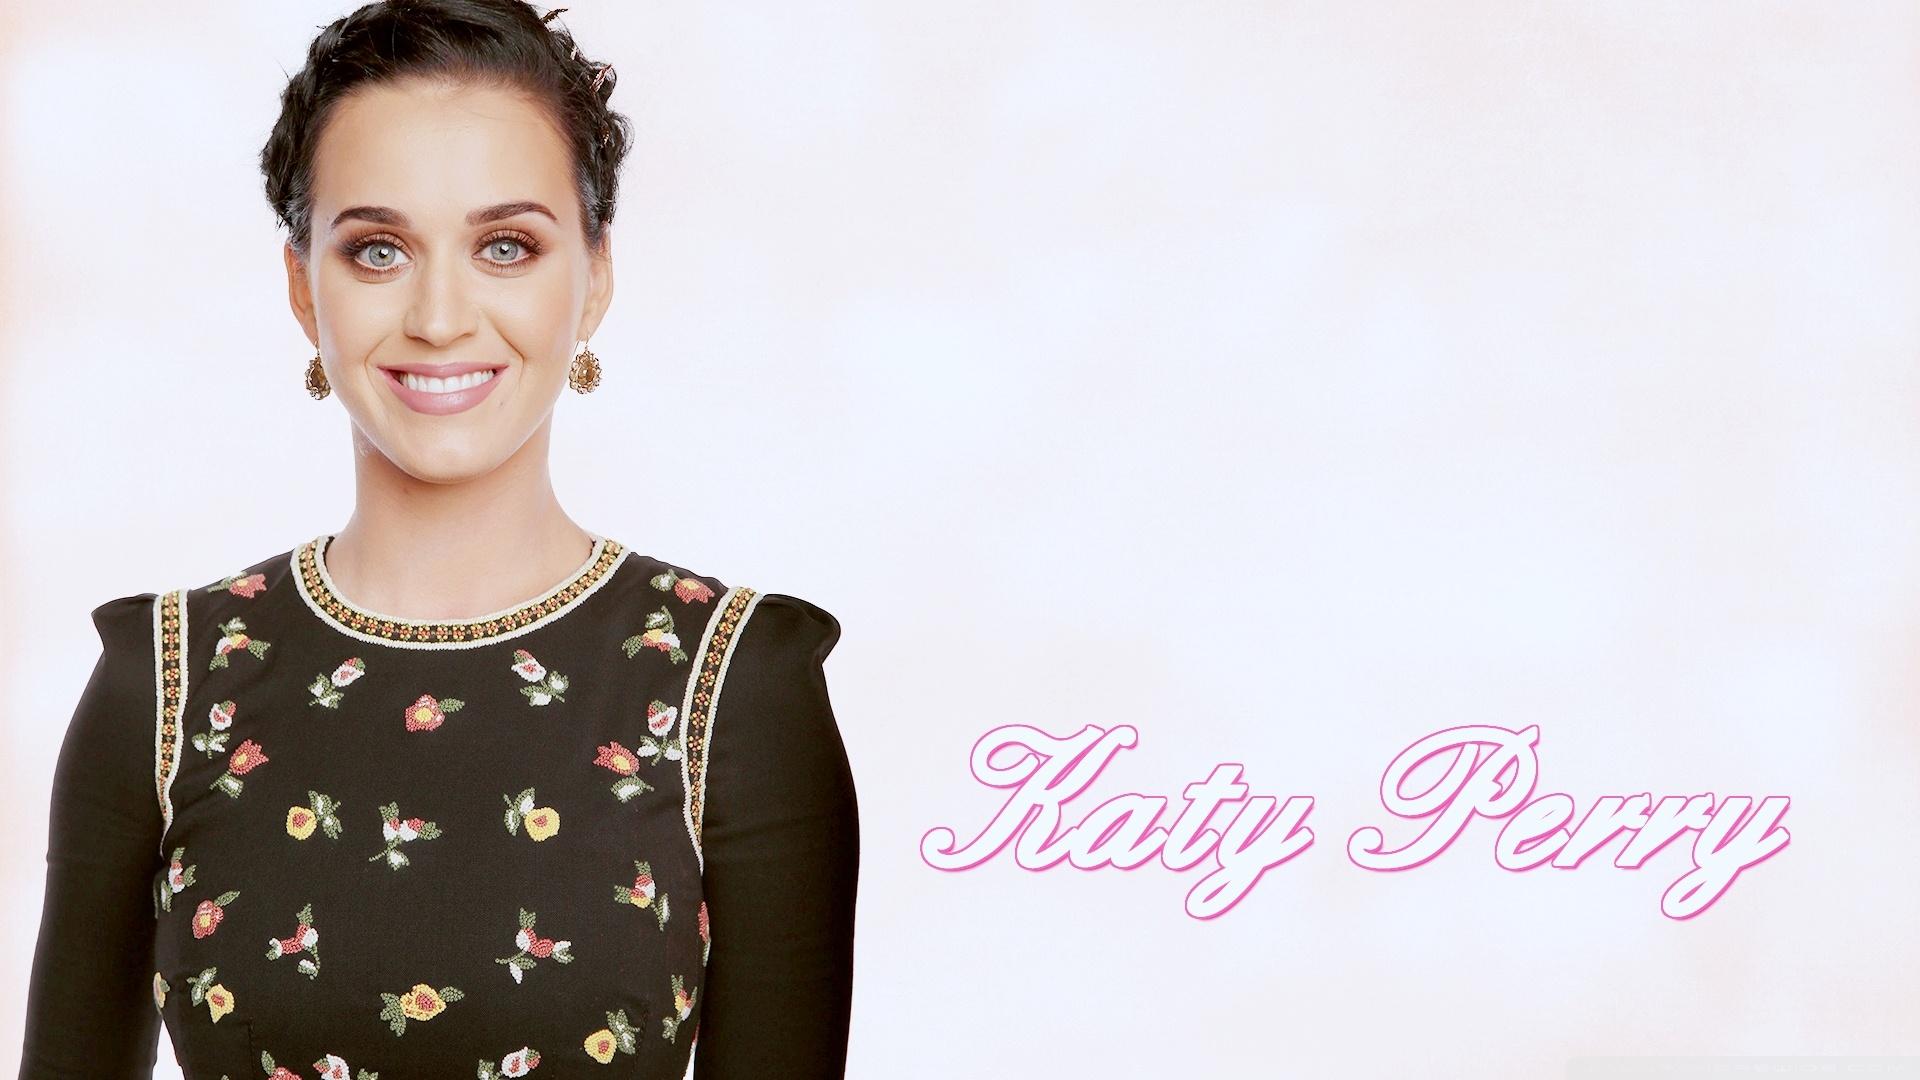 Katy Perry Wallpaper 27